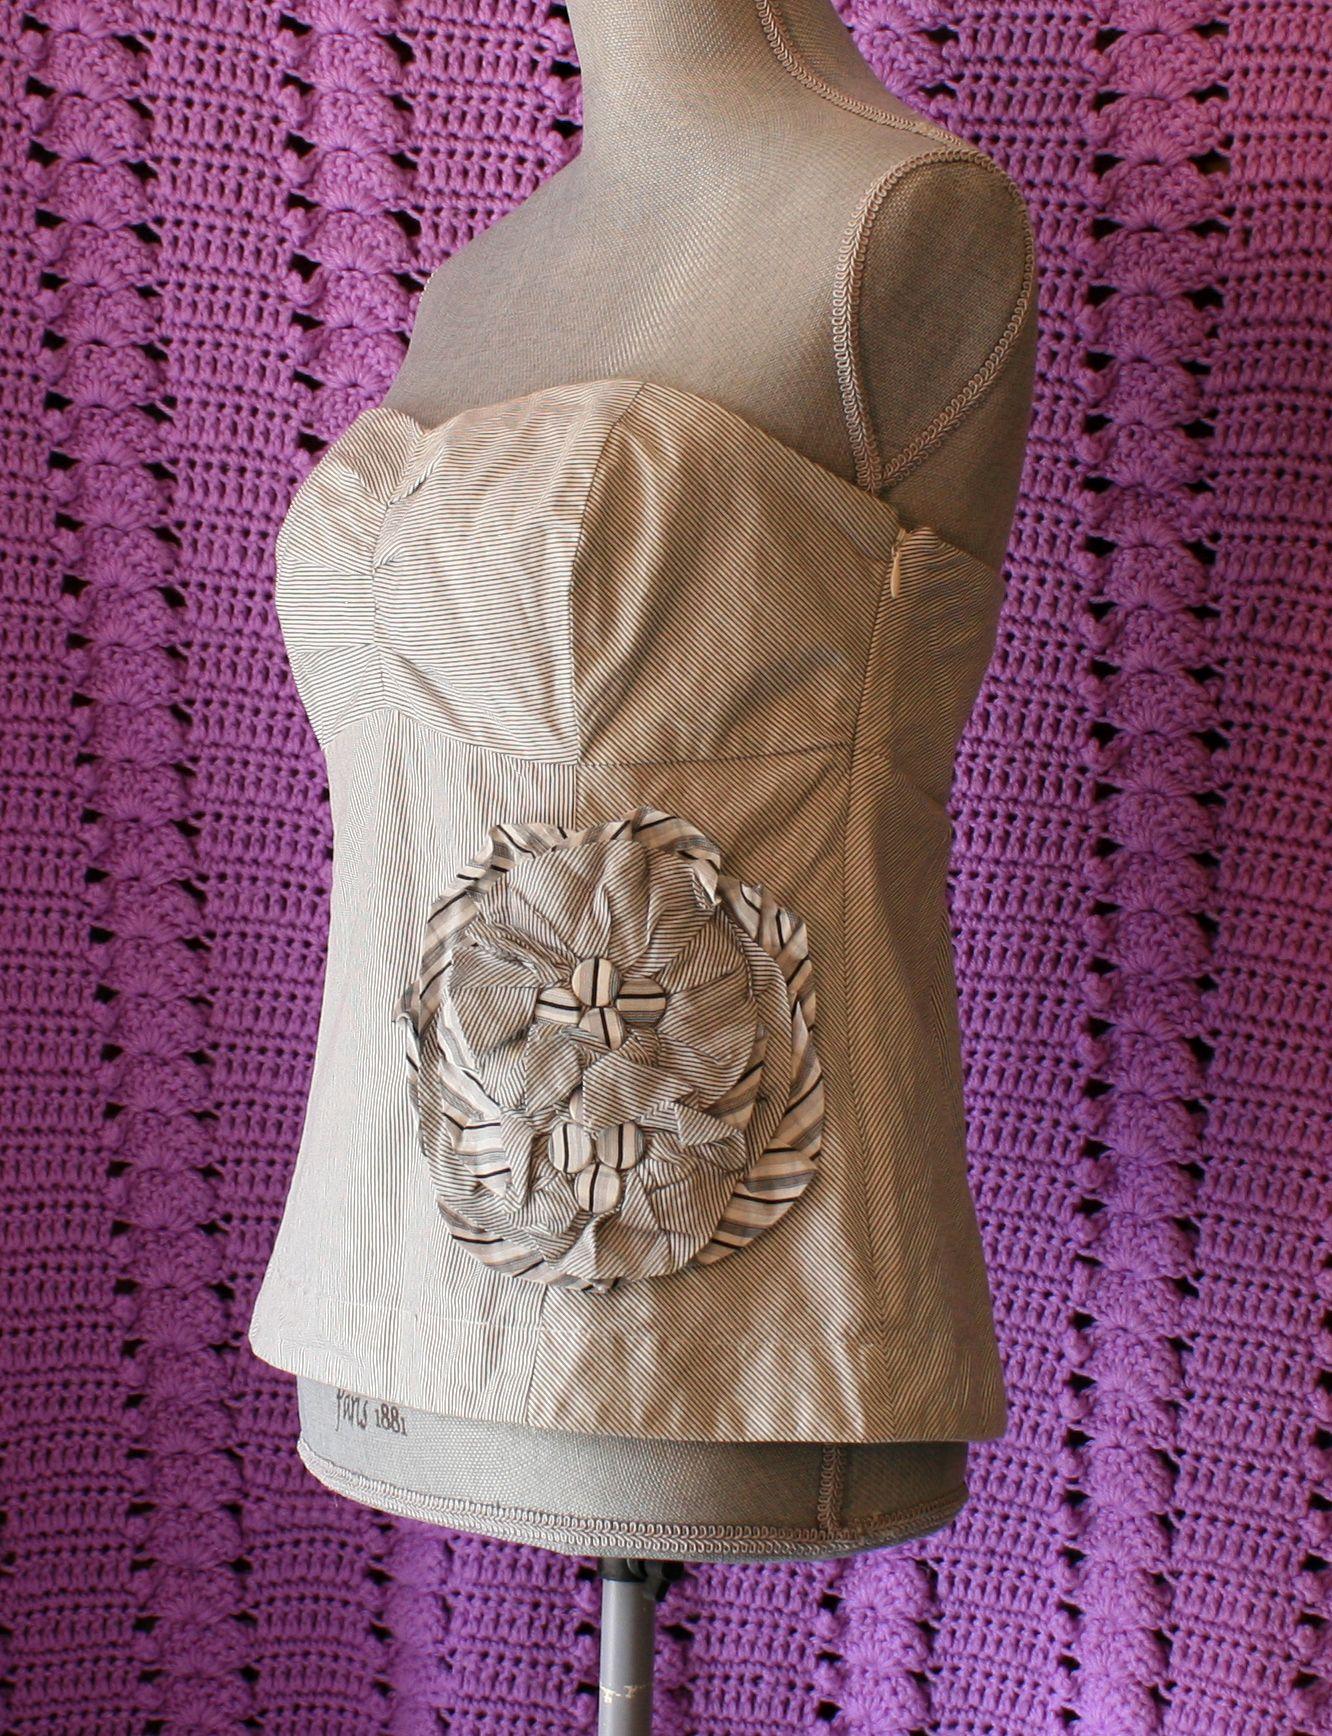 Anthropologie Blouse/Top by Floreat 10 Strapless Cotton Gray Stripes Fabulous!!!